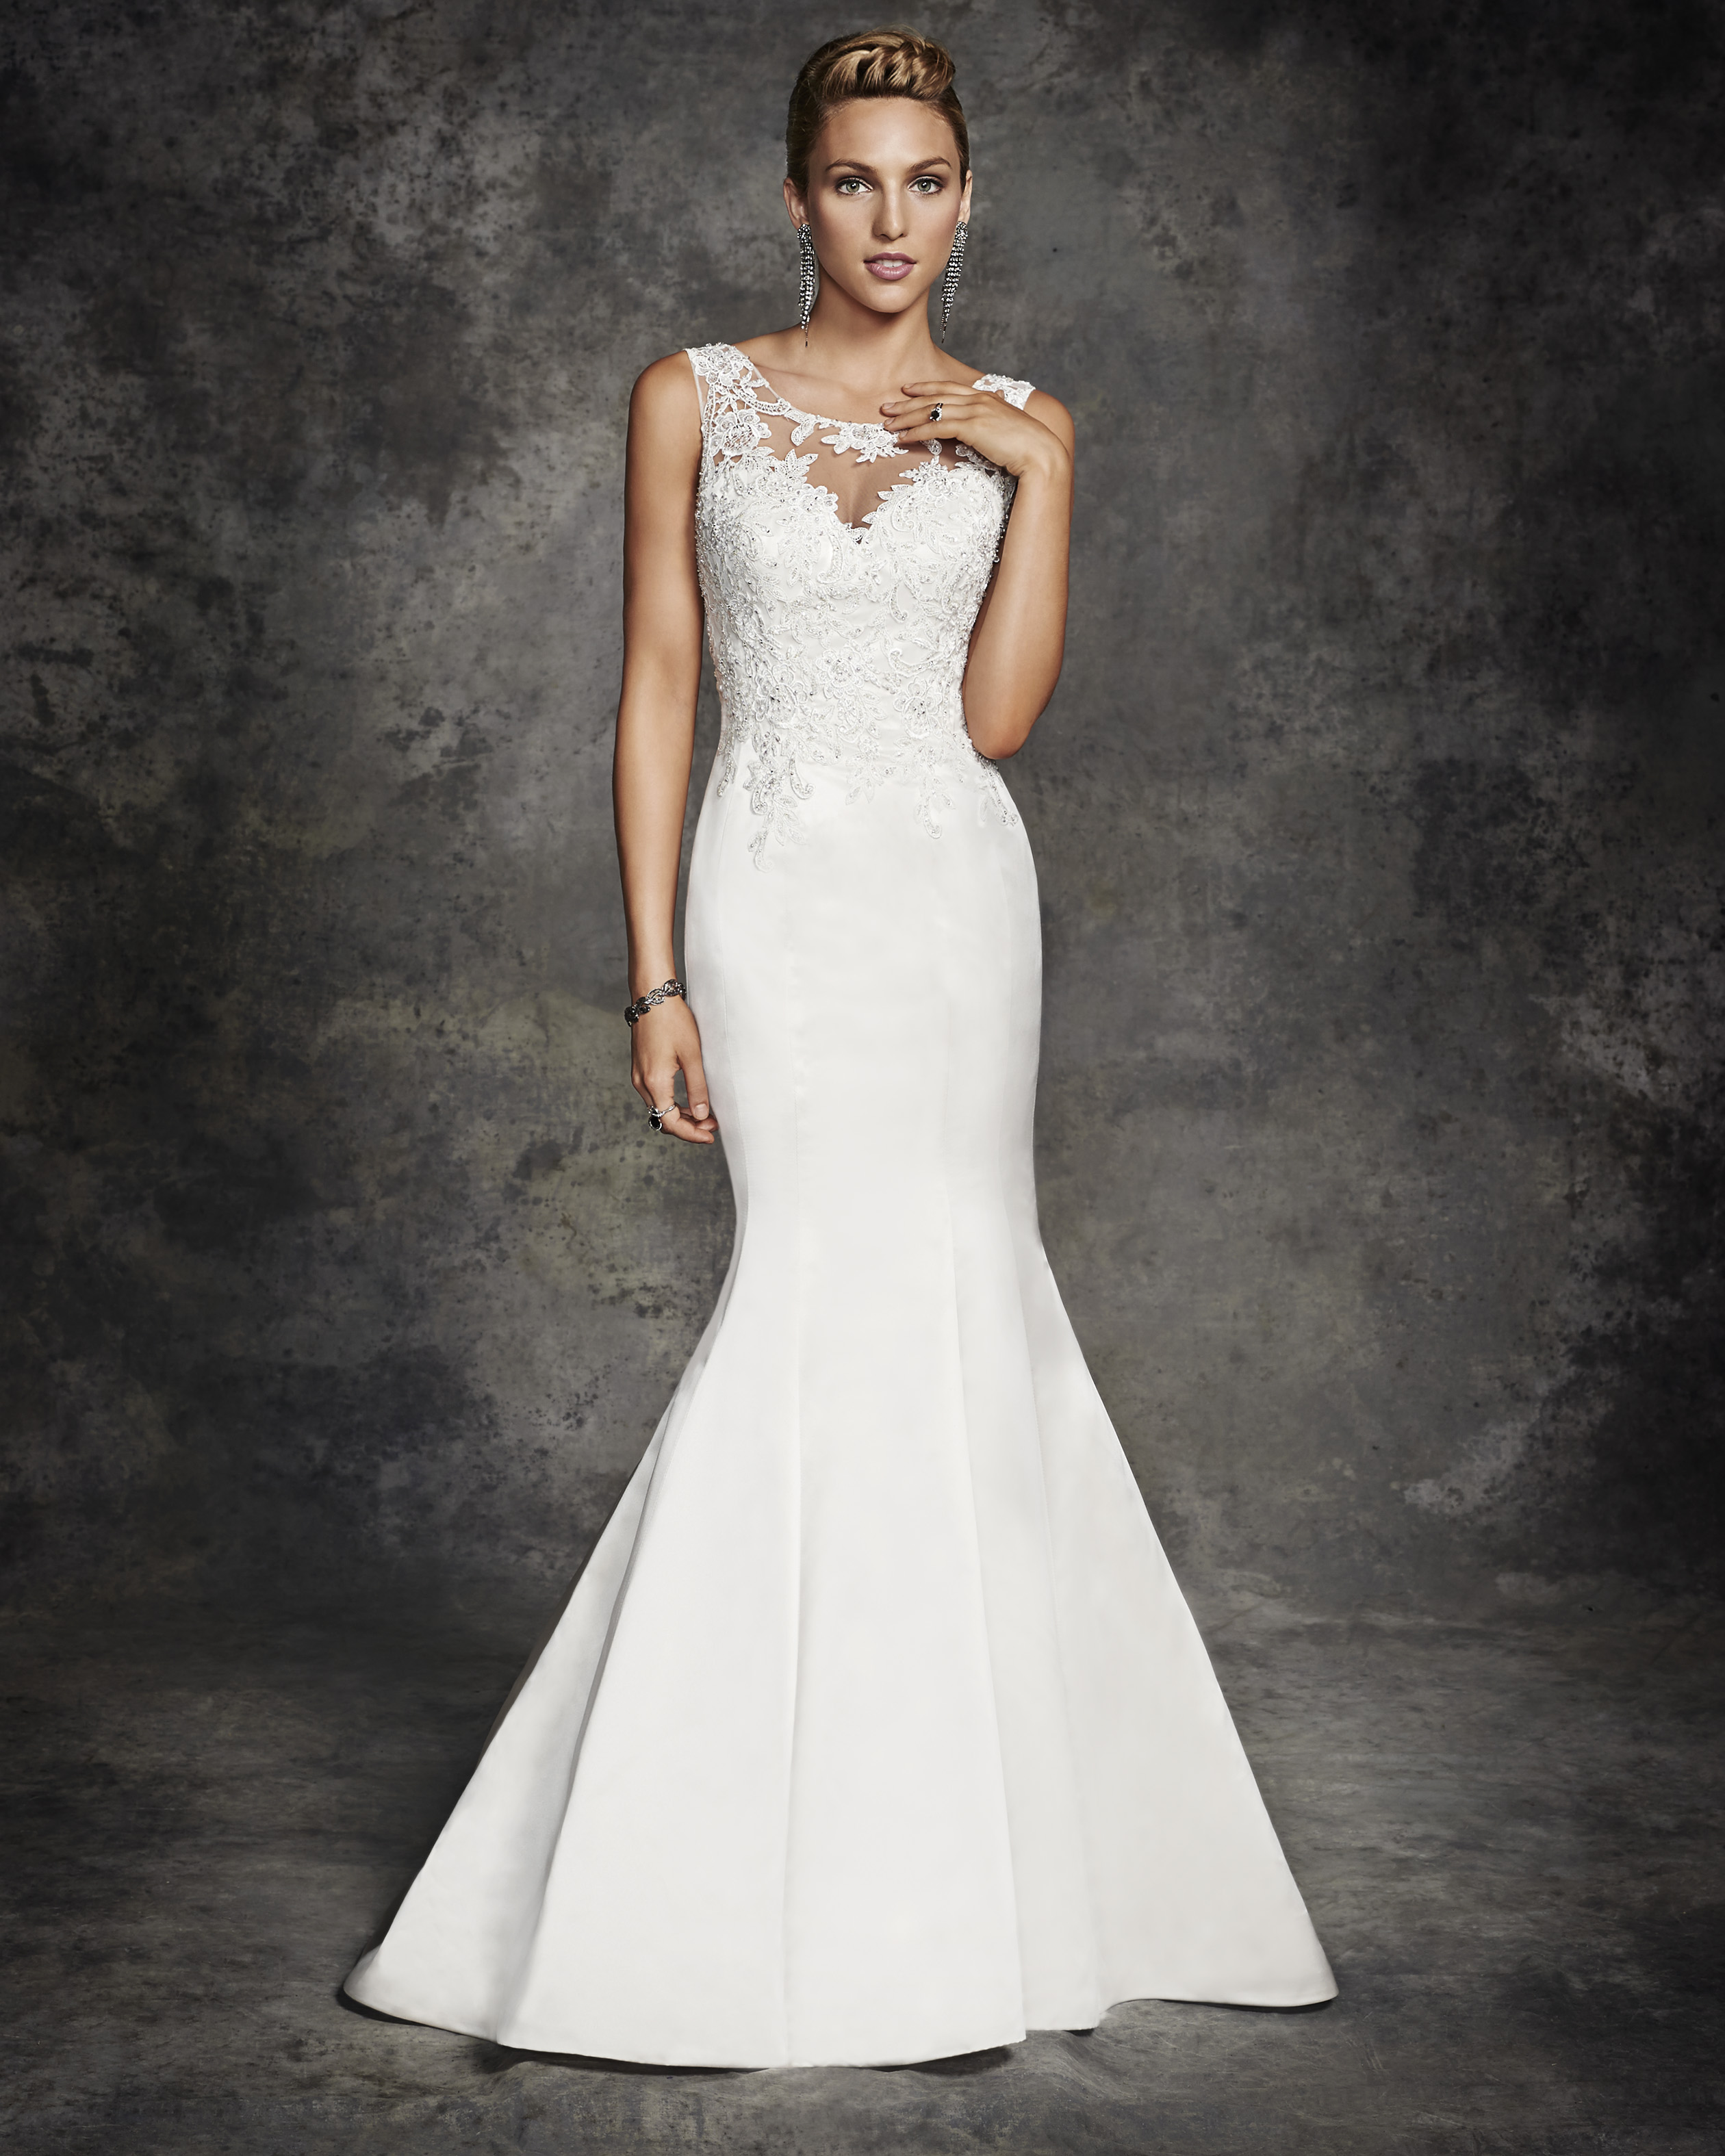 Celebrity Wedding Dress Shop Cannock 120